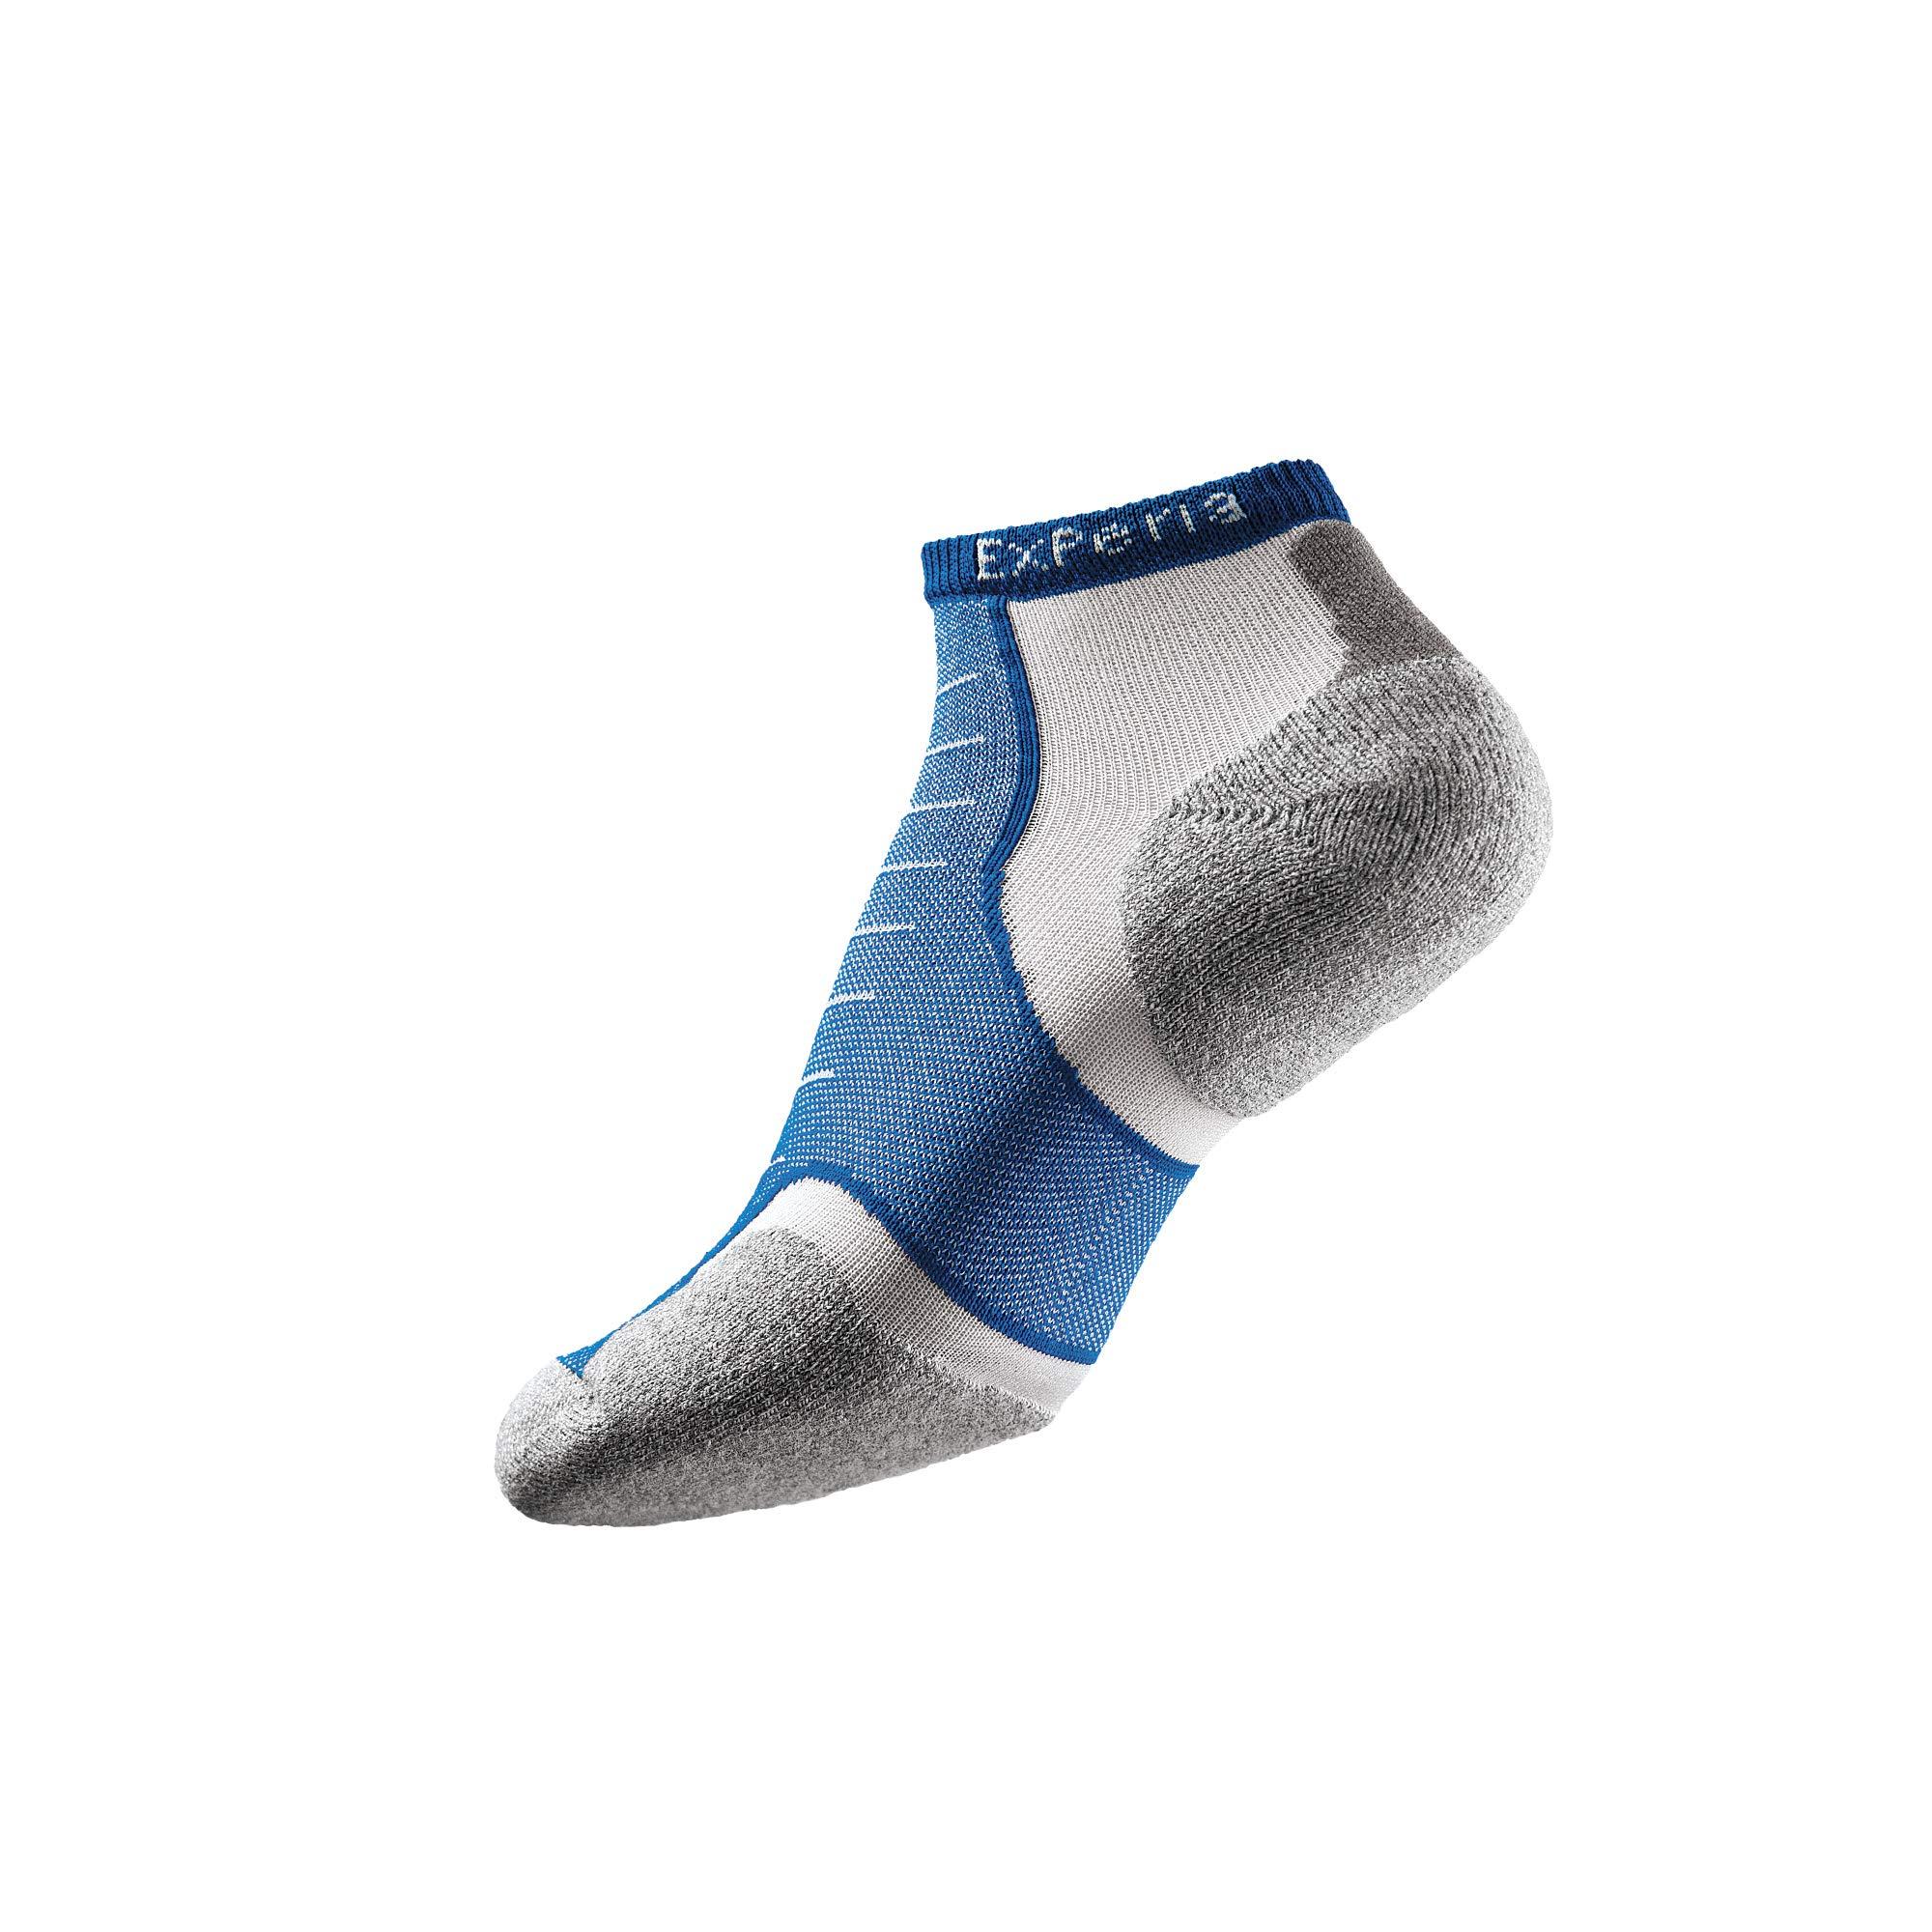 Thorlos Experia XCCU Thin Cushion Running Low Cut Sock, Royal, XL by Thorlos Experia